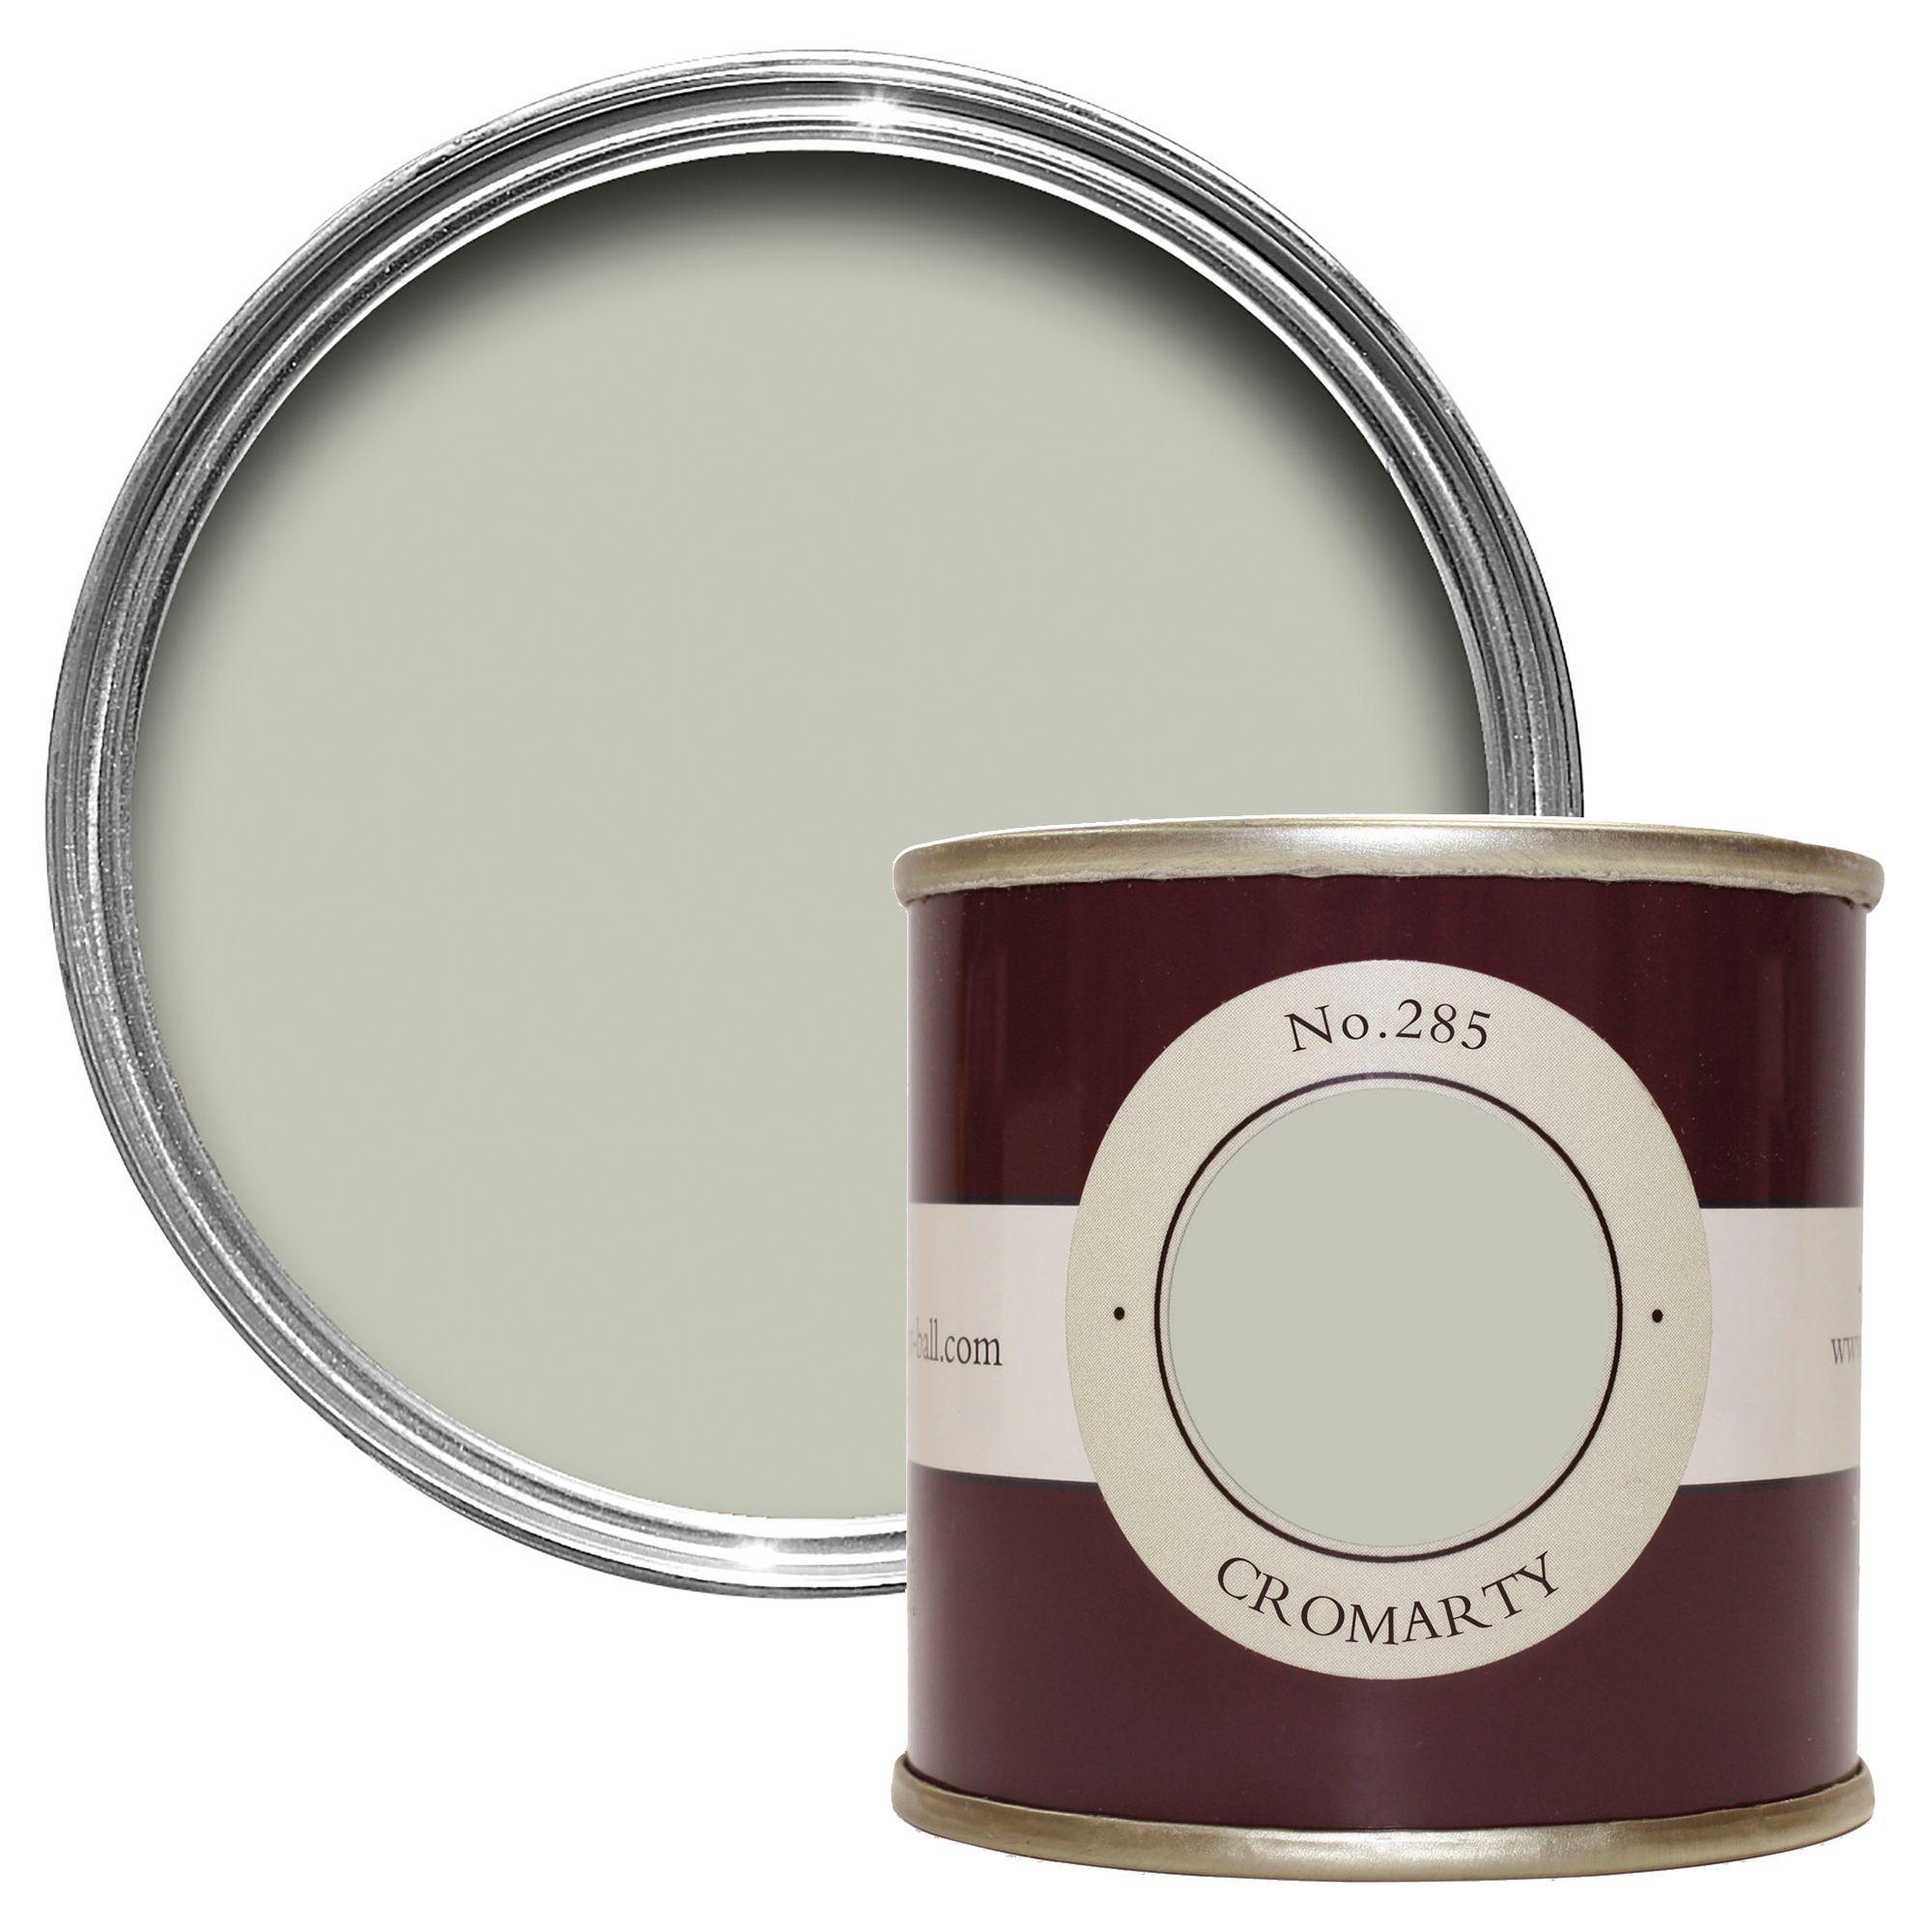 farrow ball cromarty estate emulsion paint 0 1l tester pot departments diy at b q. Black Bedroom Furniture Sets. Home Design Ideas